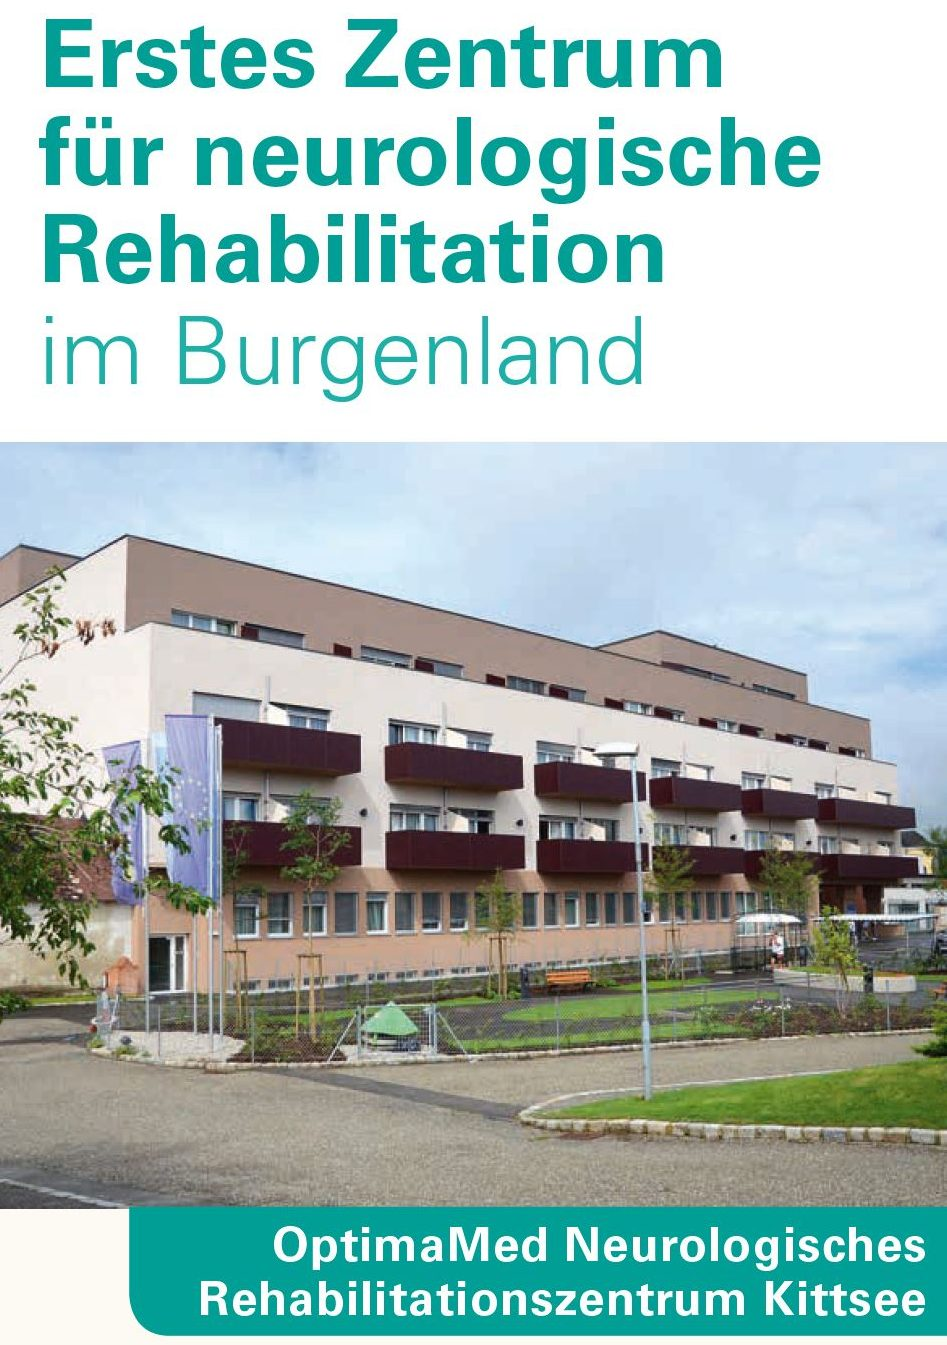 Bild Infofolder Neurologische Rehabilitation Kittsee